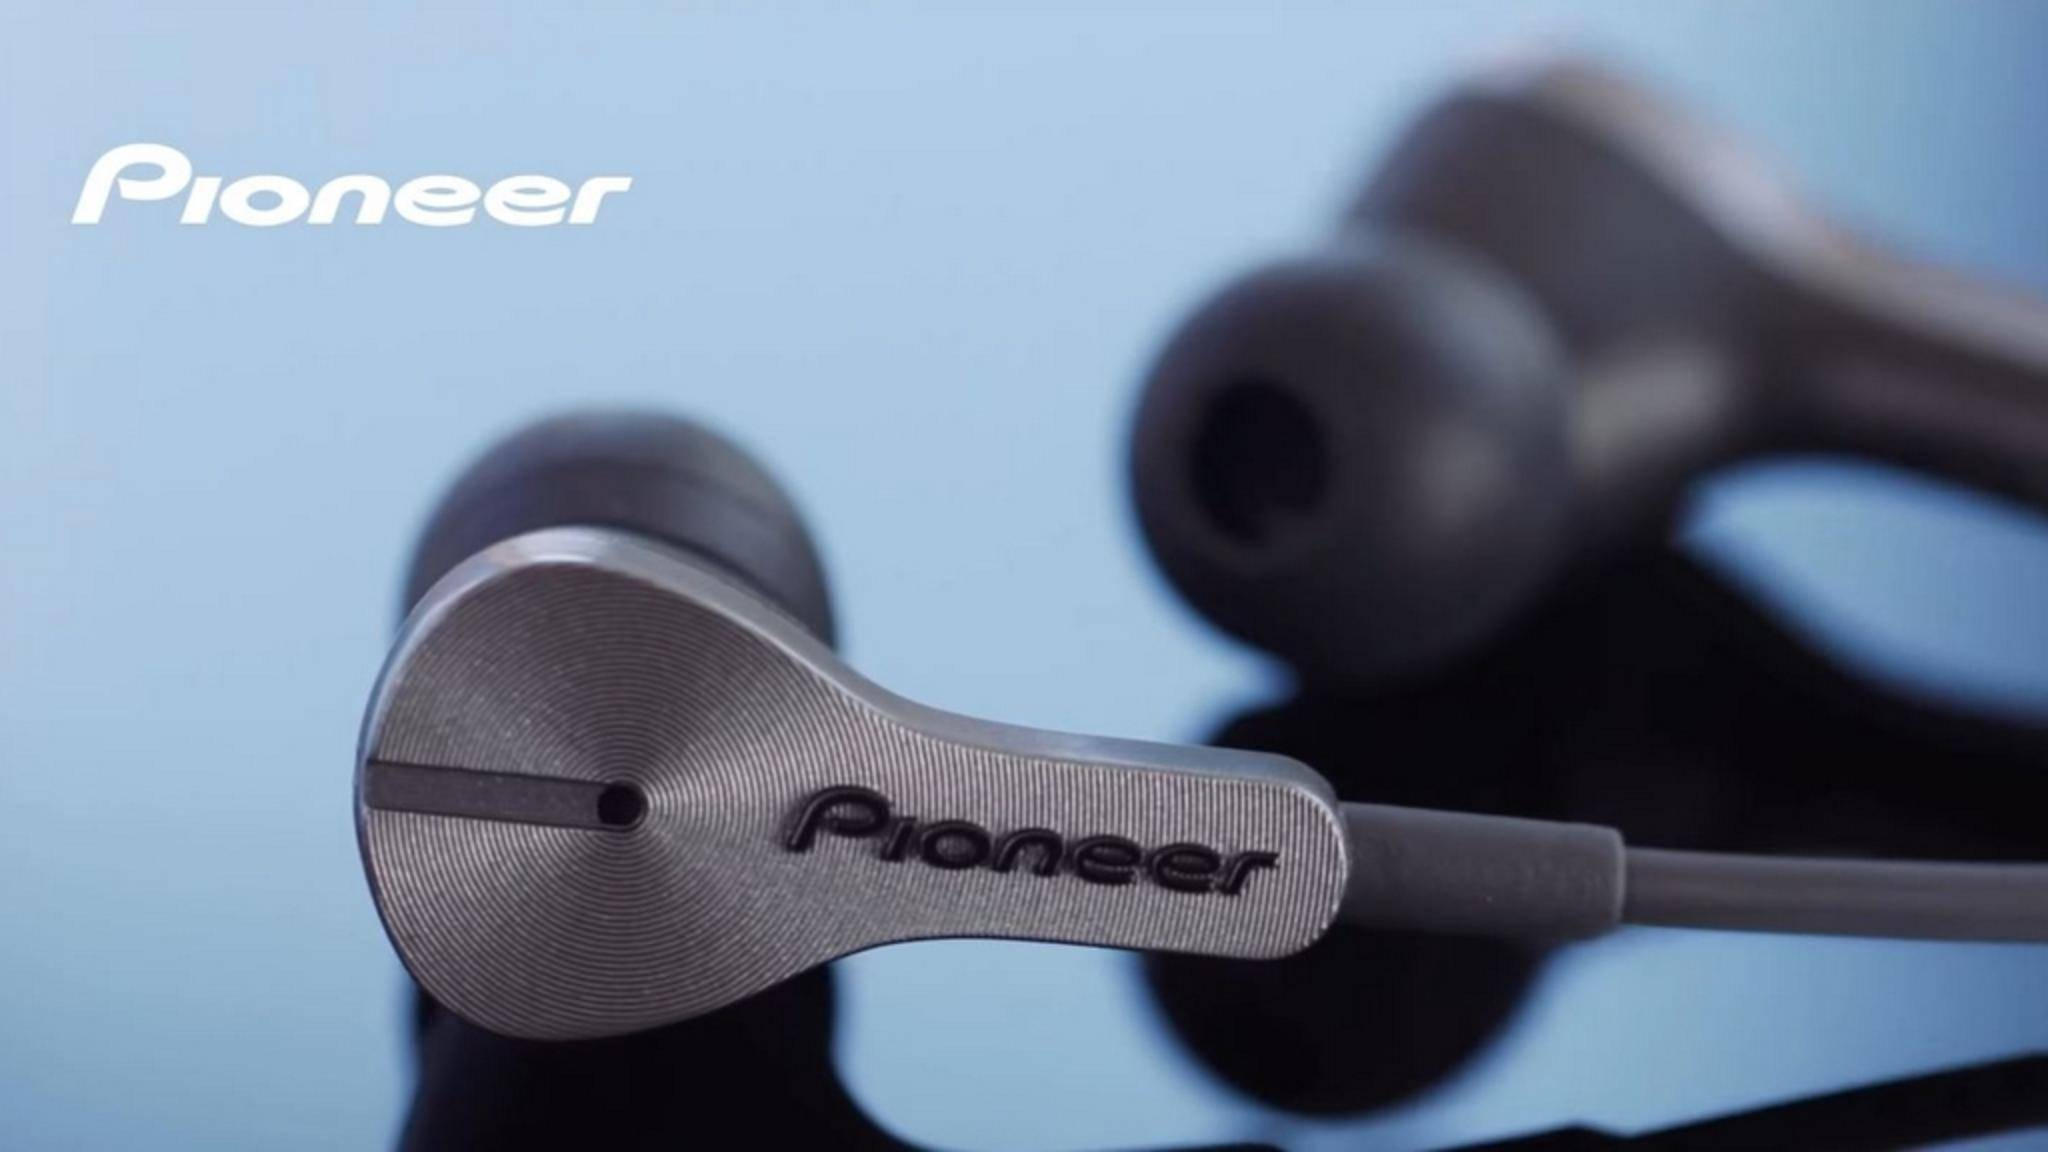 Die Pioneer Rayz werden per Lightning-Kabel ans iPhone angeschlossen.